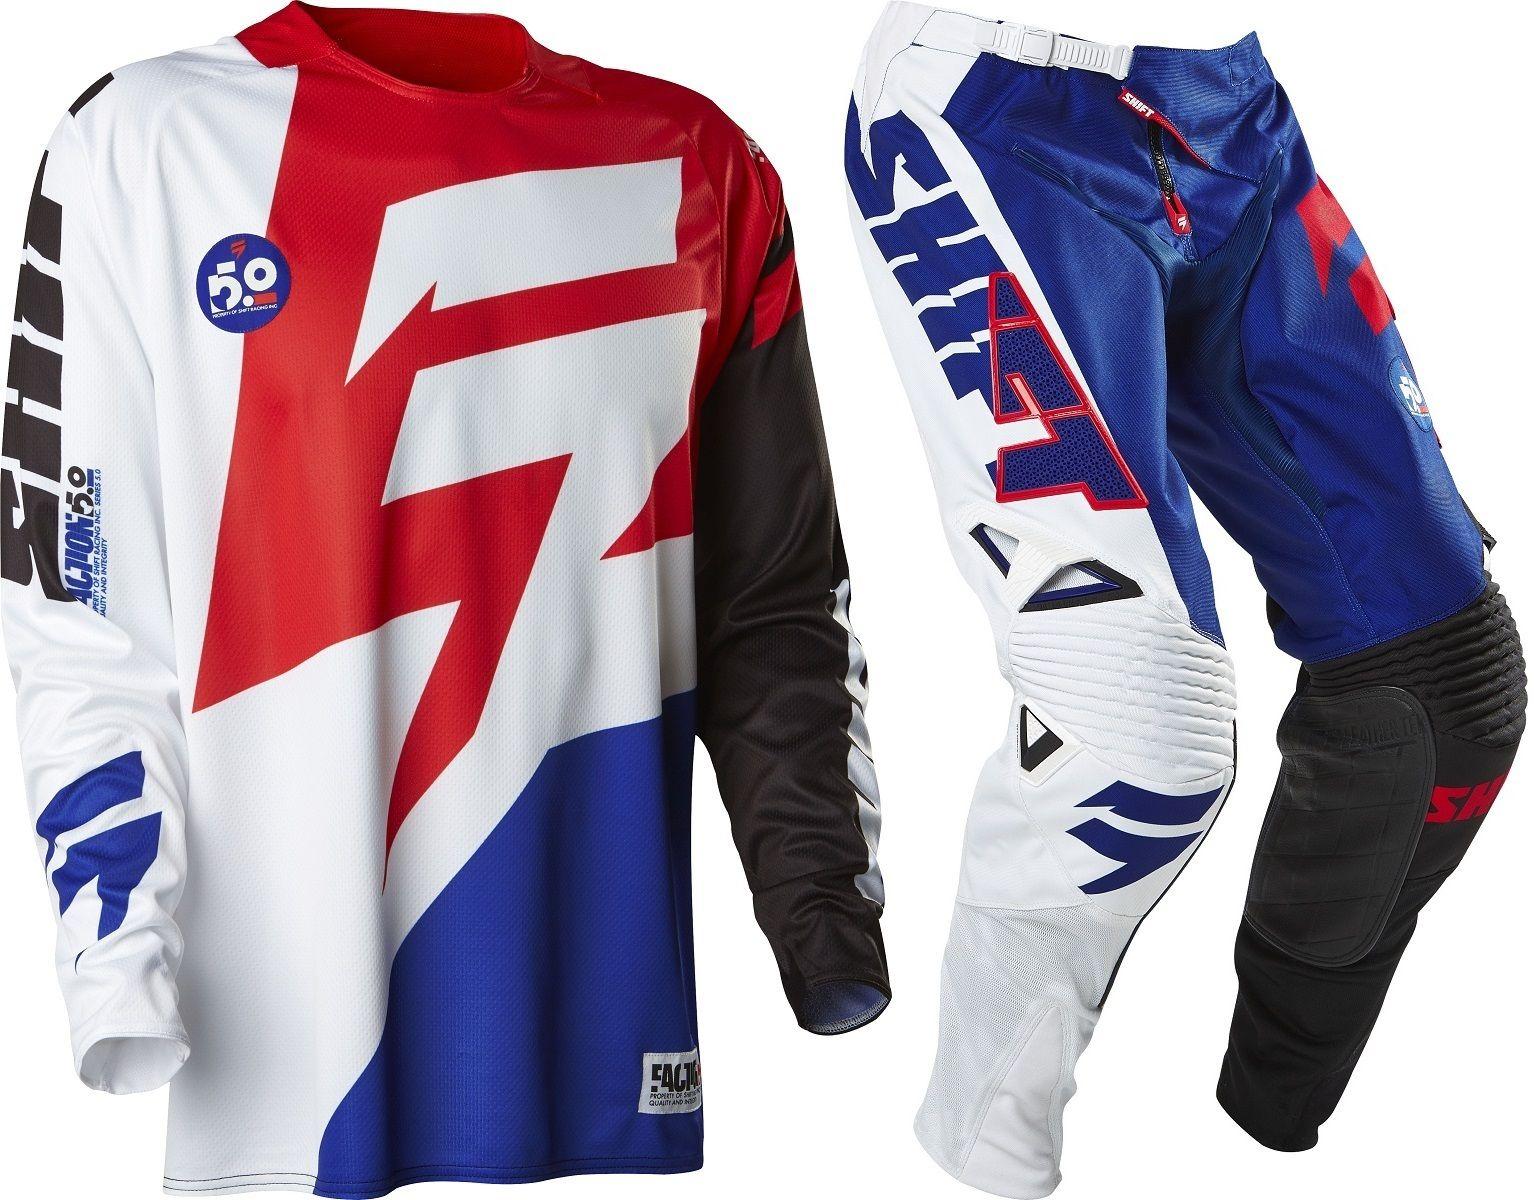 Shift NEW Mx 2018 3LACK Label Mainline Teal Motocross Dirt Bike Gear Set